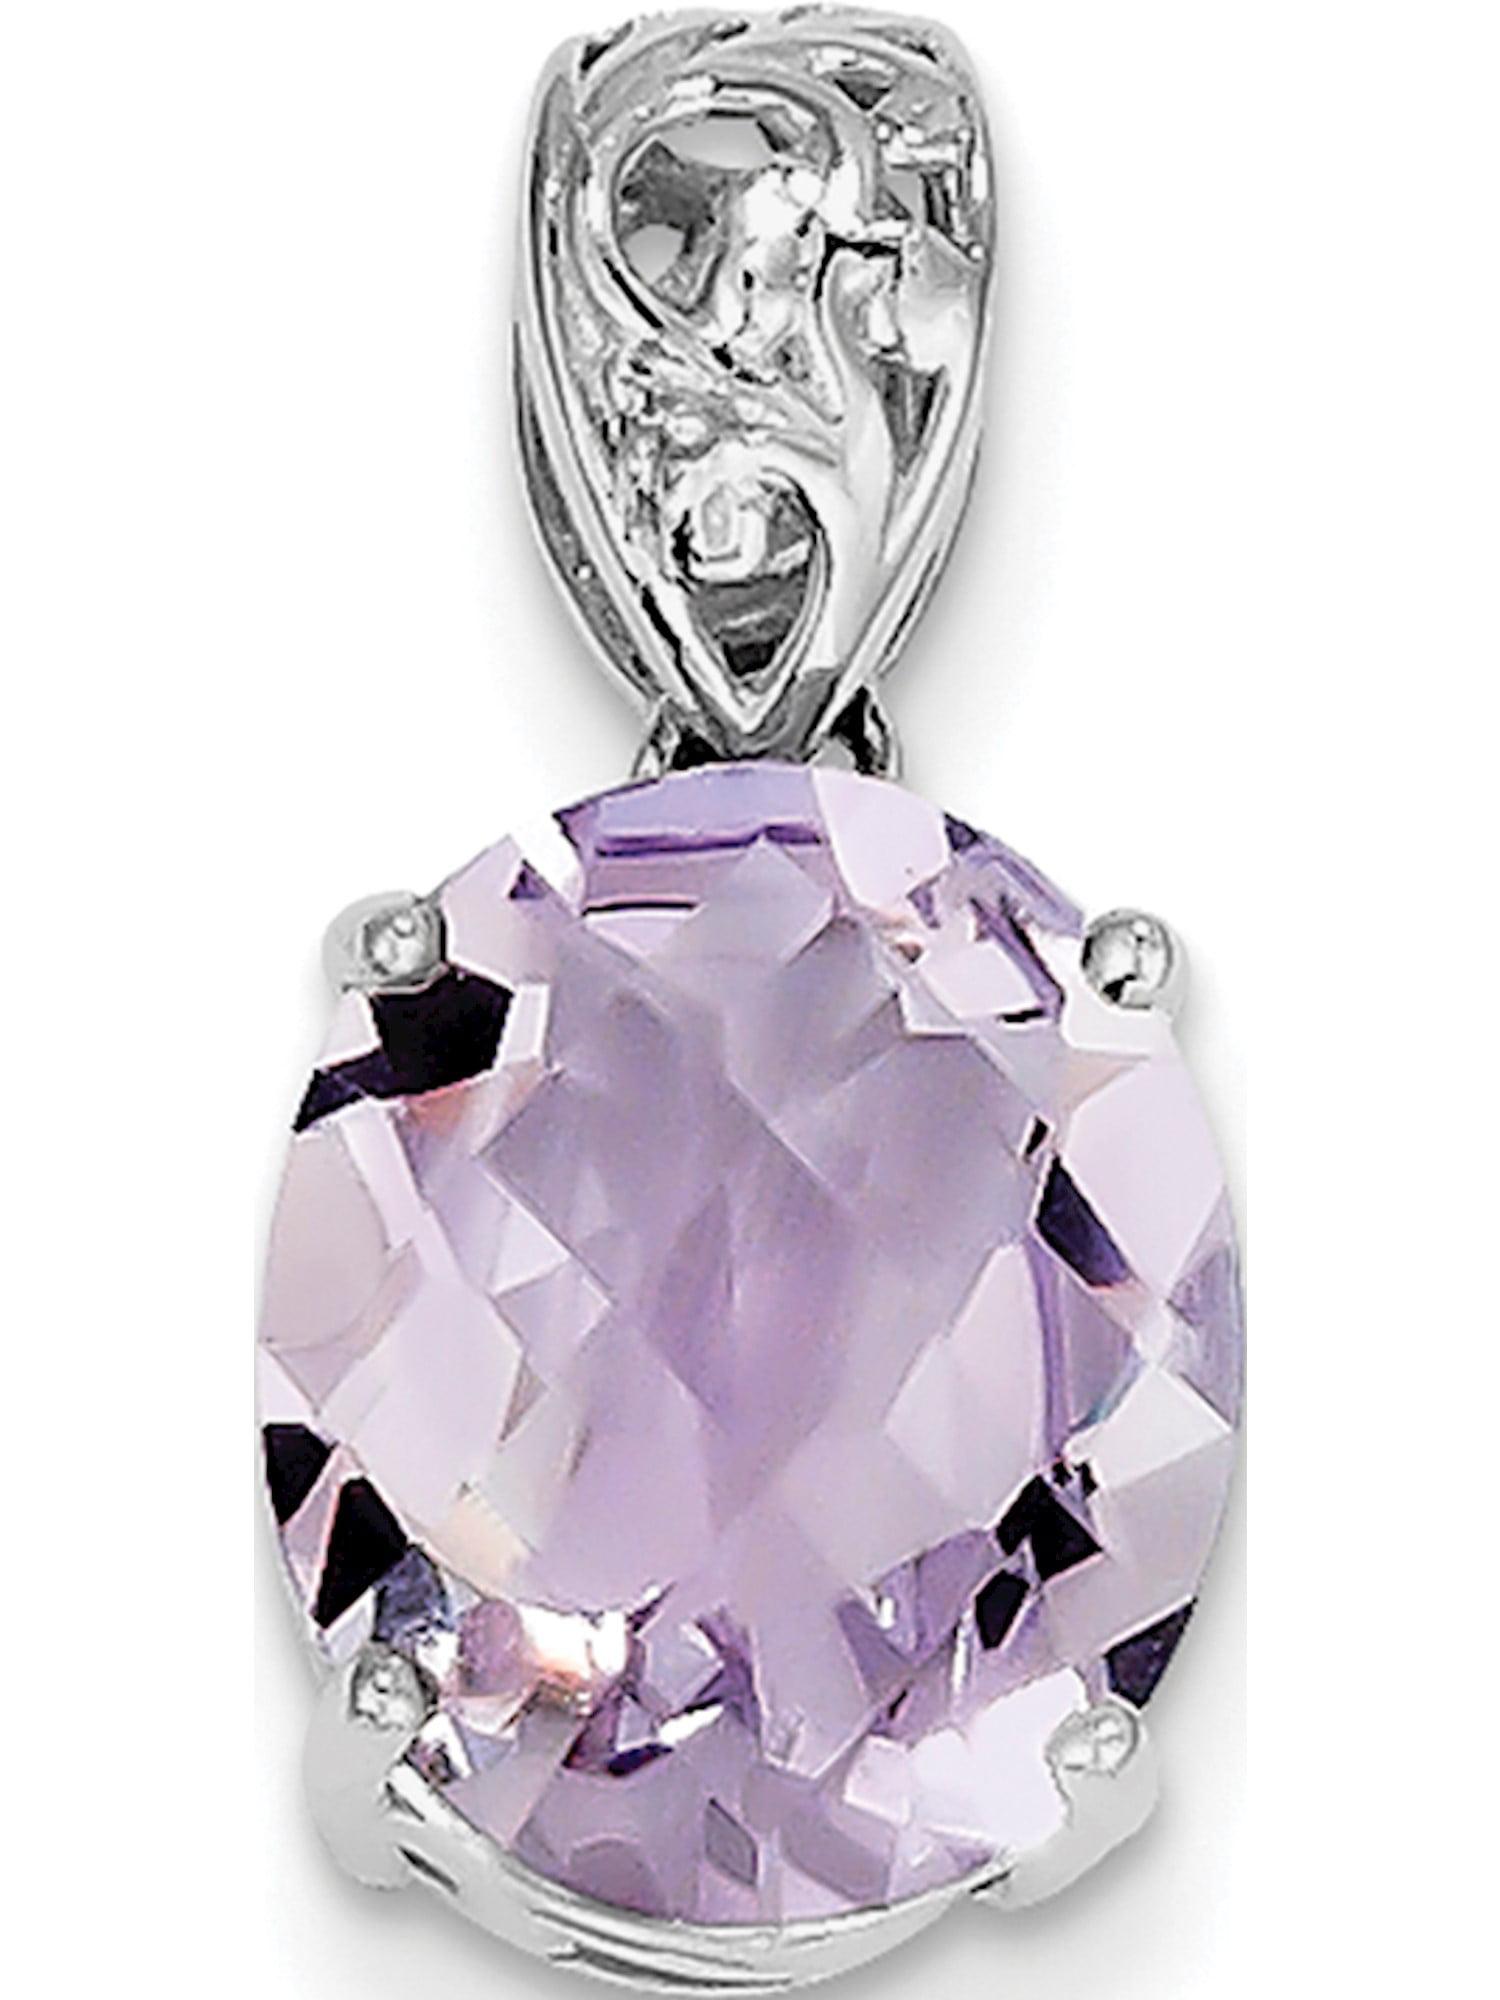 Best Designer Jewelry Sterling Silver Rhodium-plated Diamond /& Pink Quartz Pendant